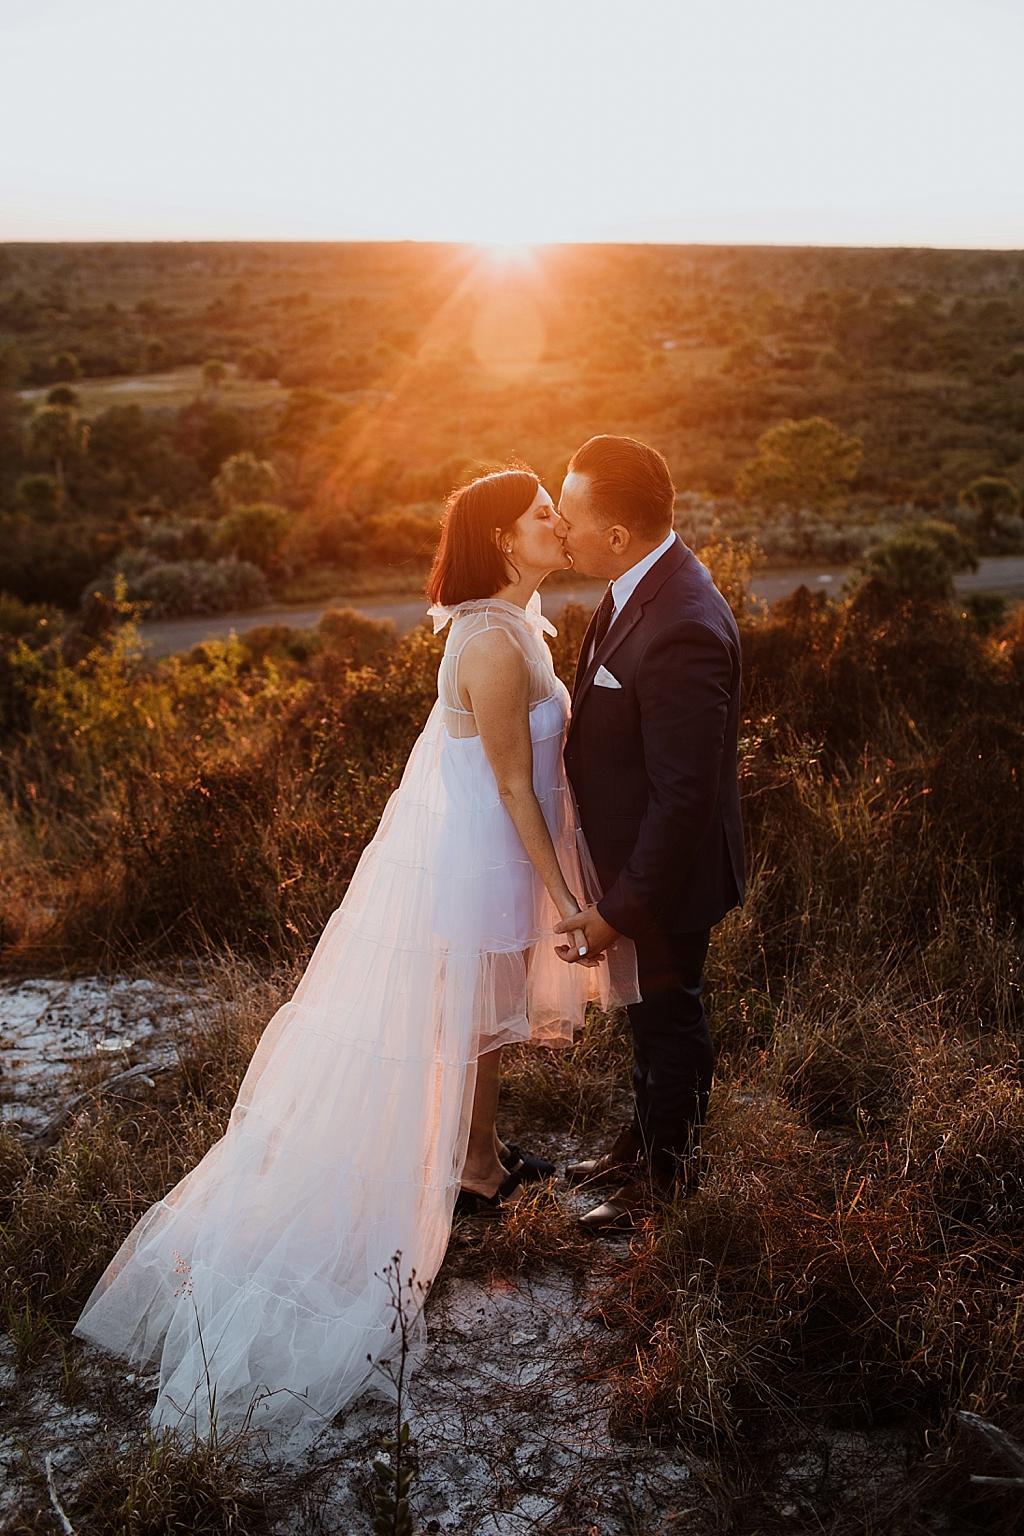 romantic sunset bride and groom portraits